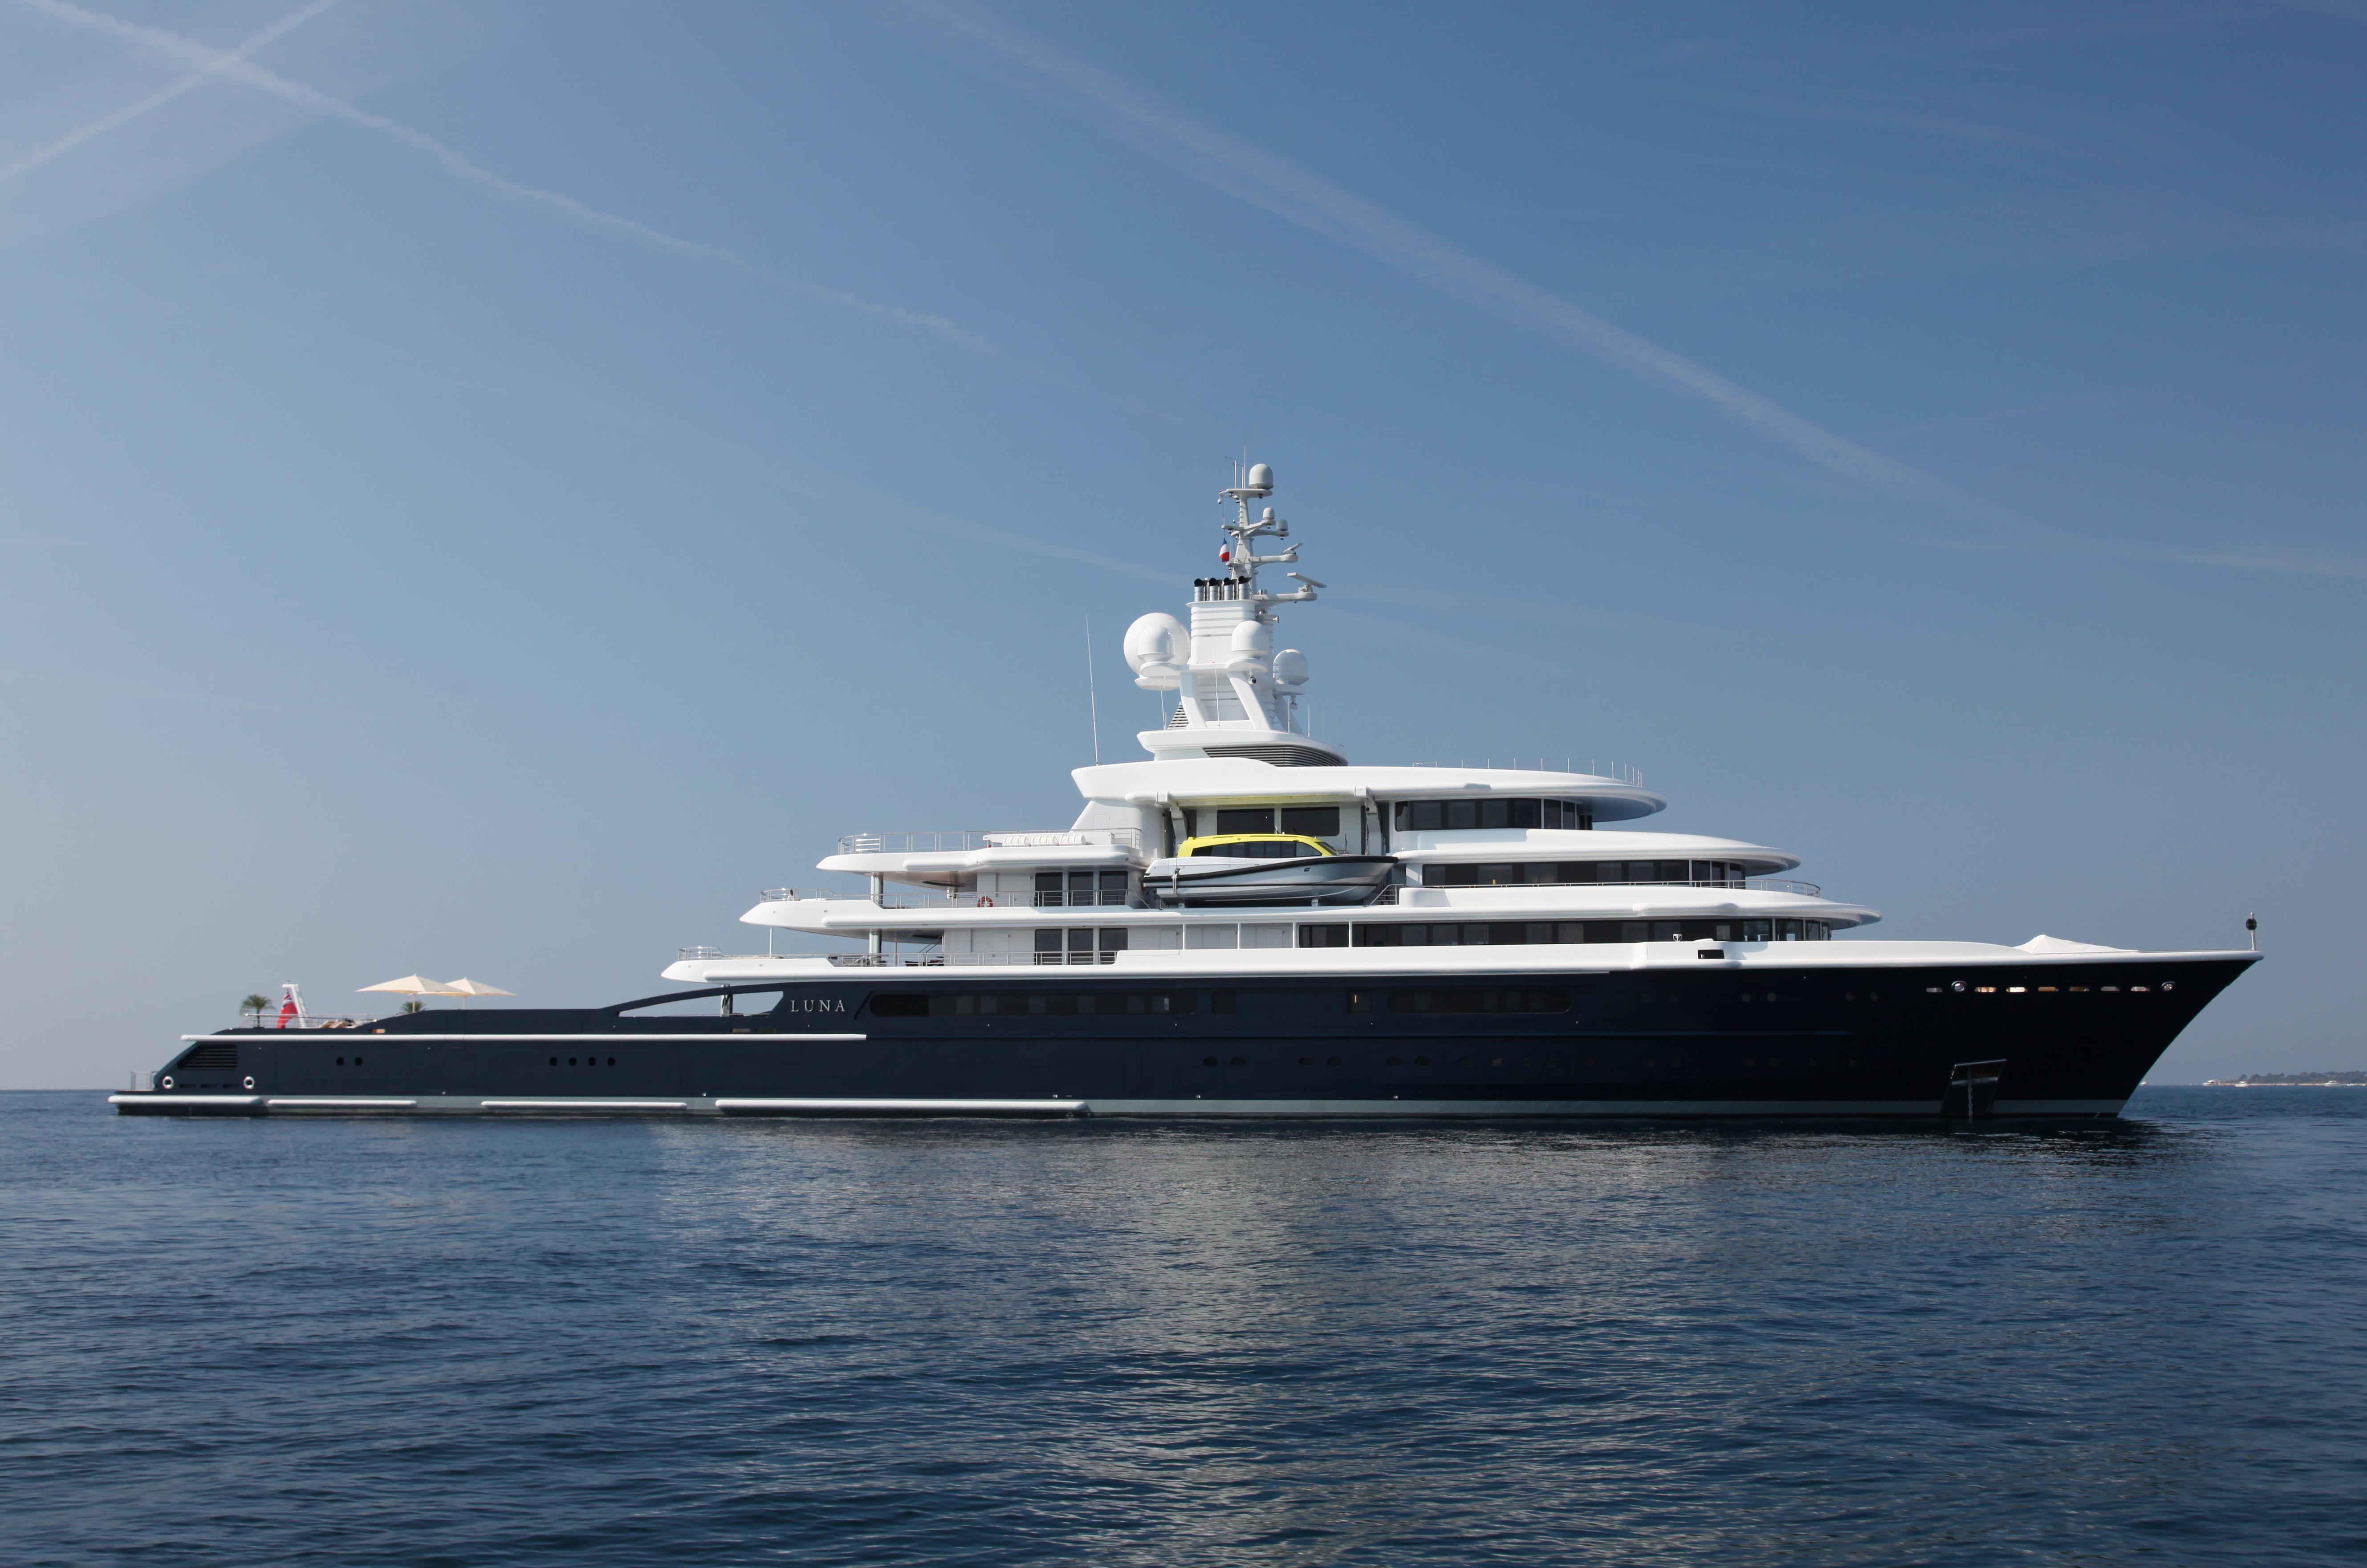 Luna Yacht Charter Details Lloyd Werft And Stahlbau